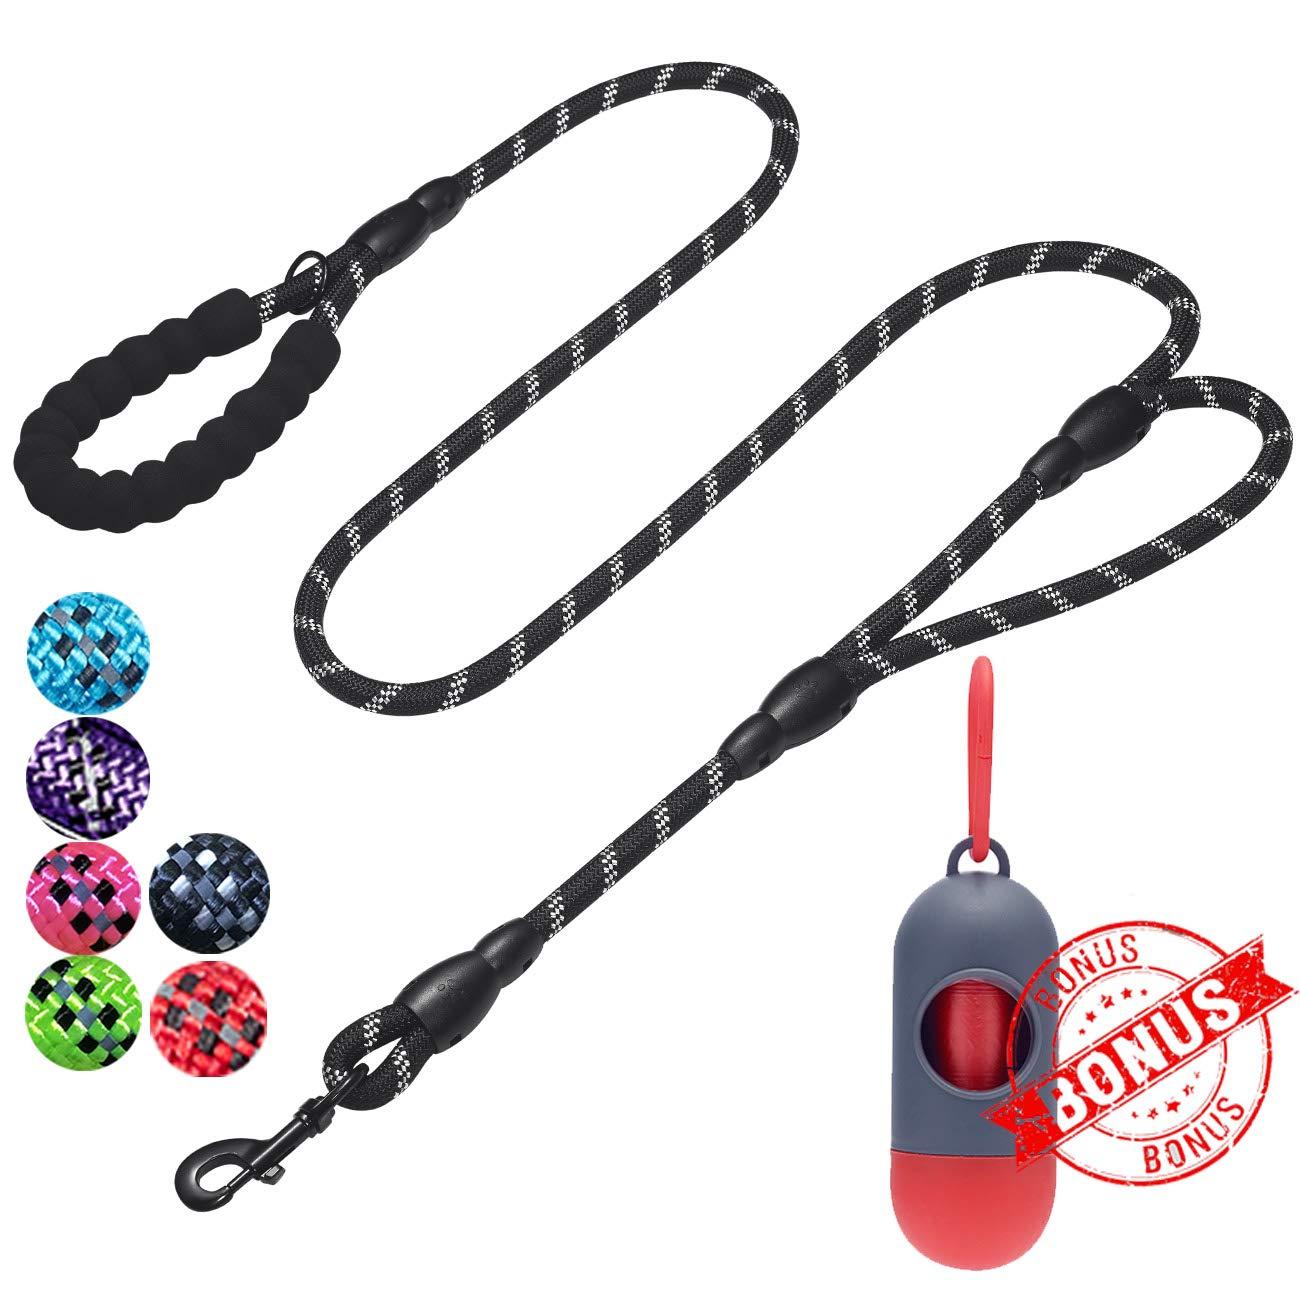 tobeDRI Heavy Duty Dog Leash - 2 Padded Handles, 6 feet Long - Dog Training Walking Leashes for Medium Large Dogs (Rope Leash-Black) by tobeDRI